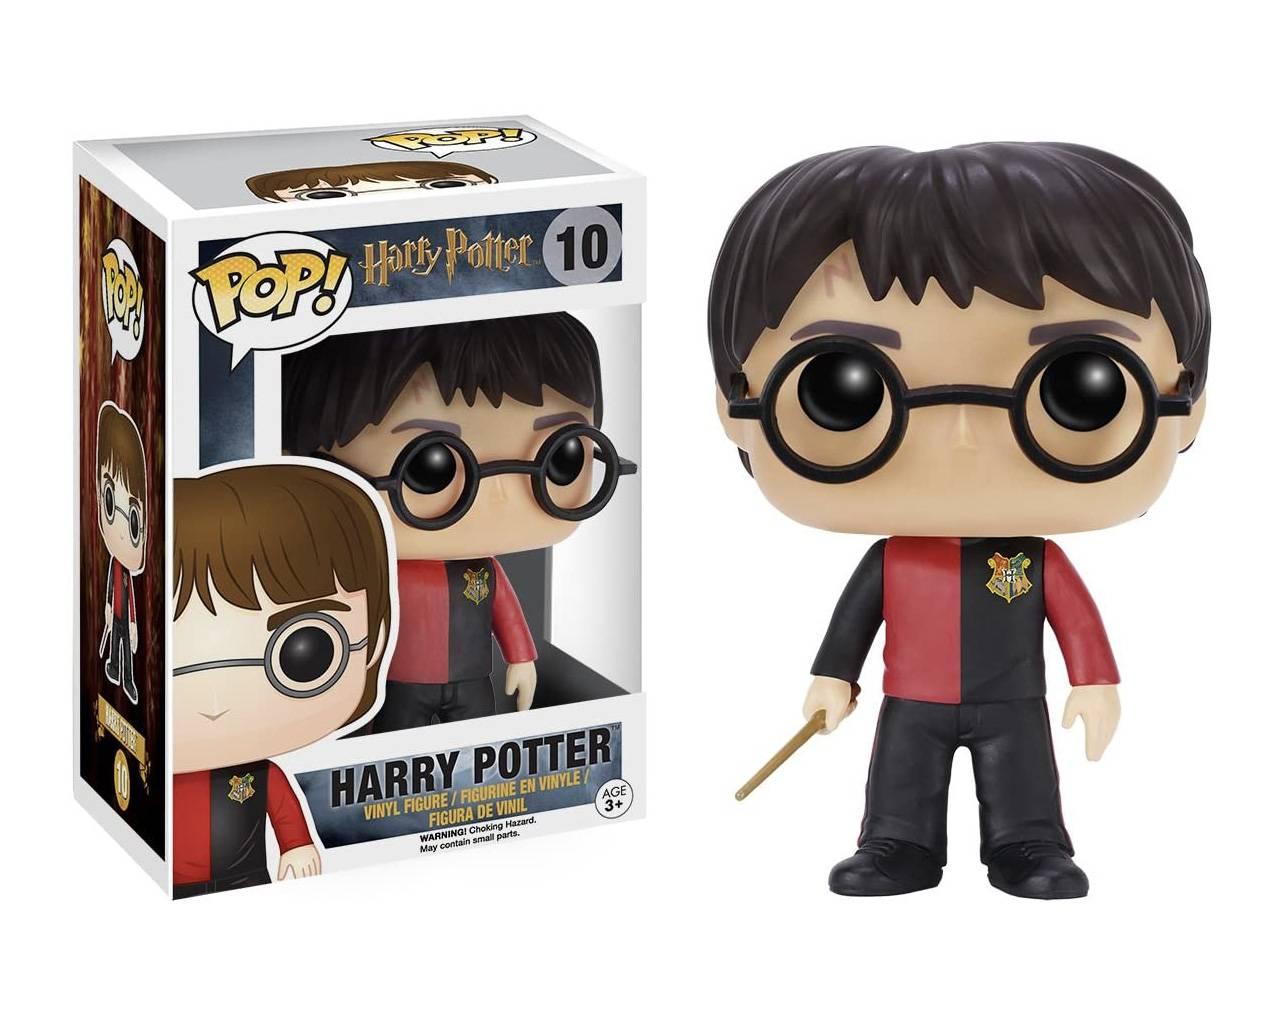 Harry Potter (Tri Wizard) Pop! Vinyl